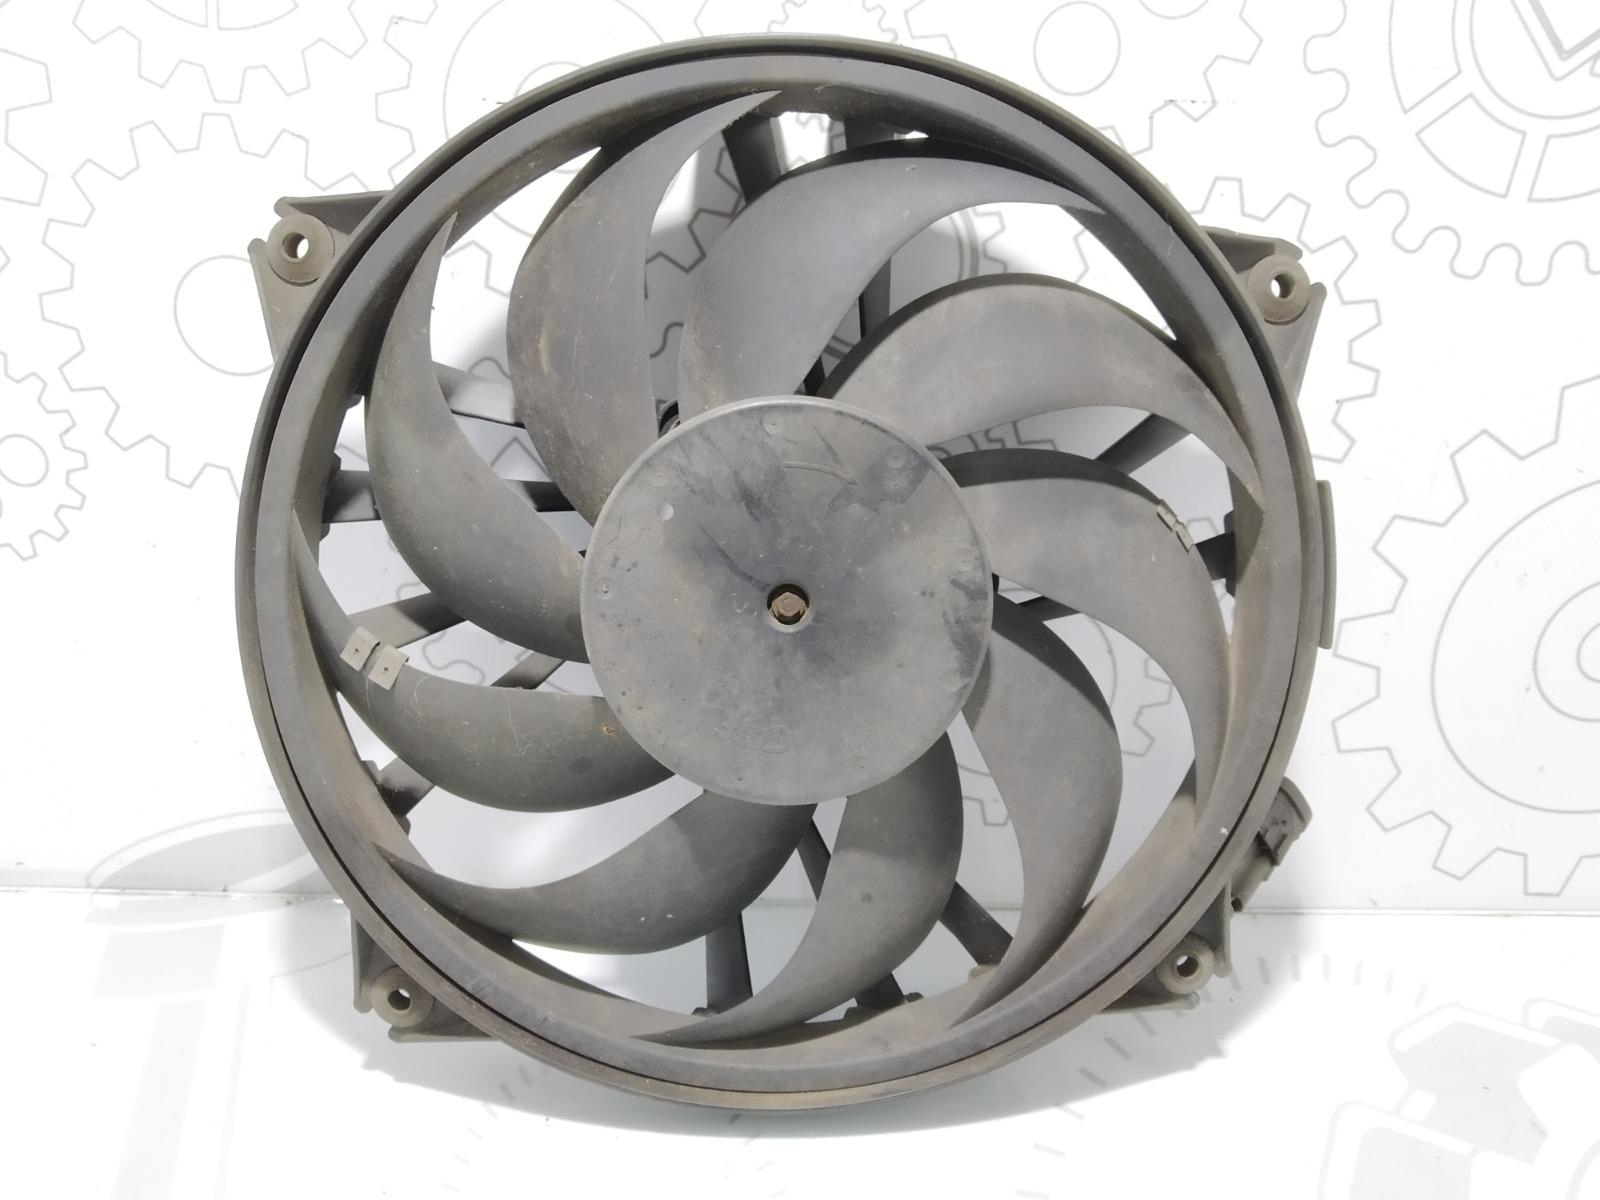 Вентилятор радиатора Peugeot Partner 2.0 HDI 2003 (б/у)